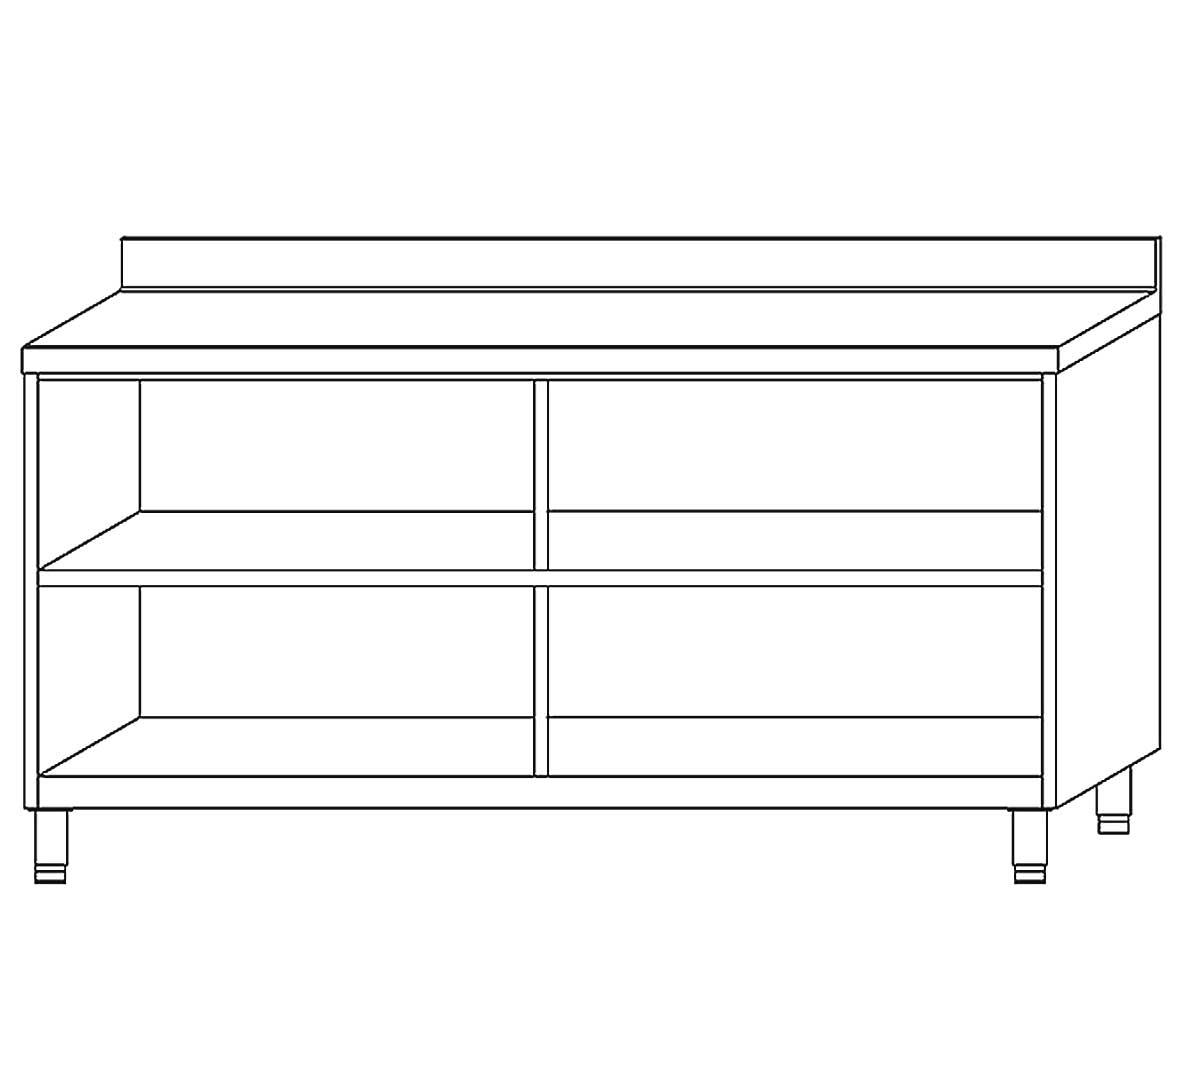 Mueble estanter a ecm60 de docriluc for Mueble cocina 60 x 30